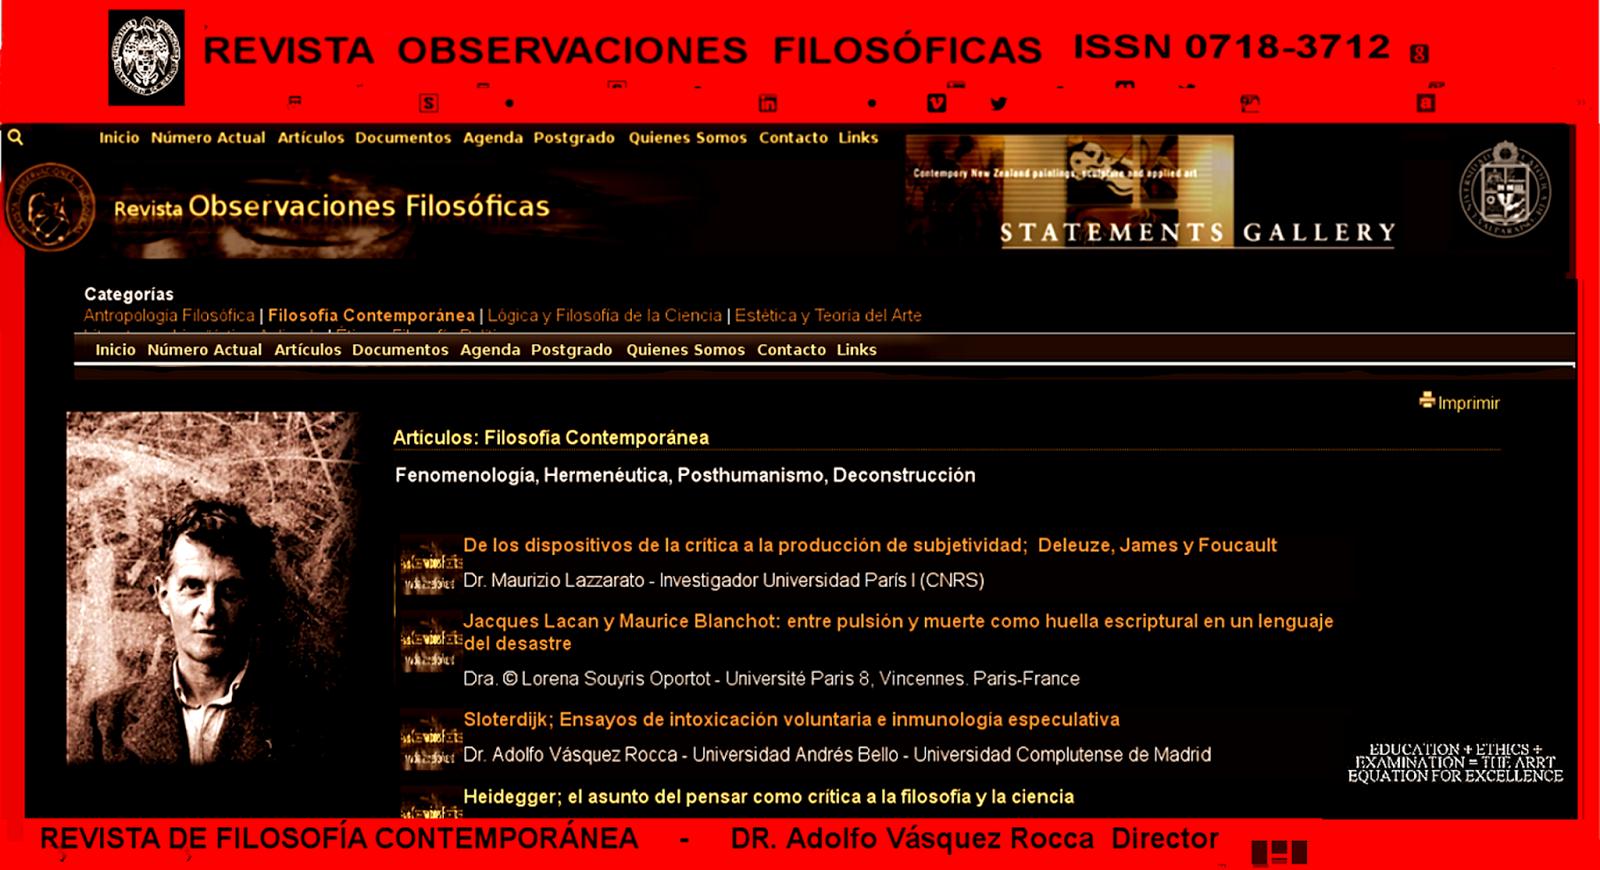 http://4.bp.blogspot.com/-eLo-RKsYvNA/Um6AHFRtJTI/AAAAAAAALeQ/d8a7alDgO30/s1600/Revista+de+Filosofia+Contemporanea++_++Revista+OBSERVACIONES+FILOSOFICAS+_+Adolfo+Vasquez+Rocca+Wittgenstein+7+XL+.png